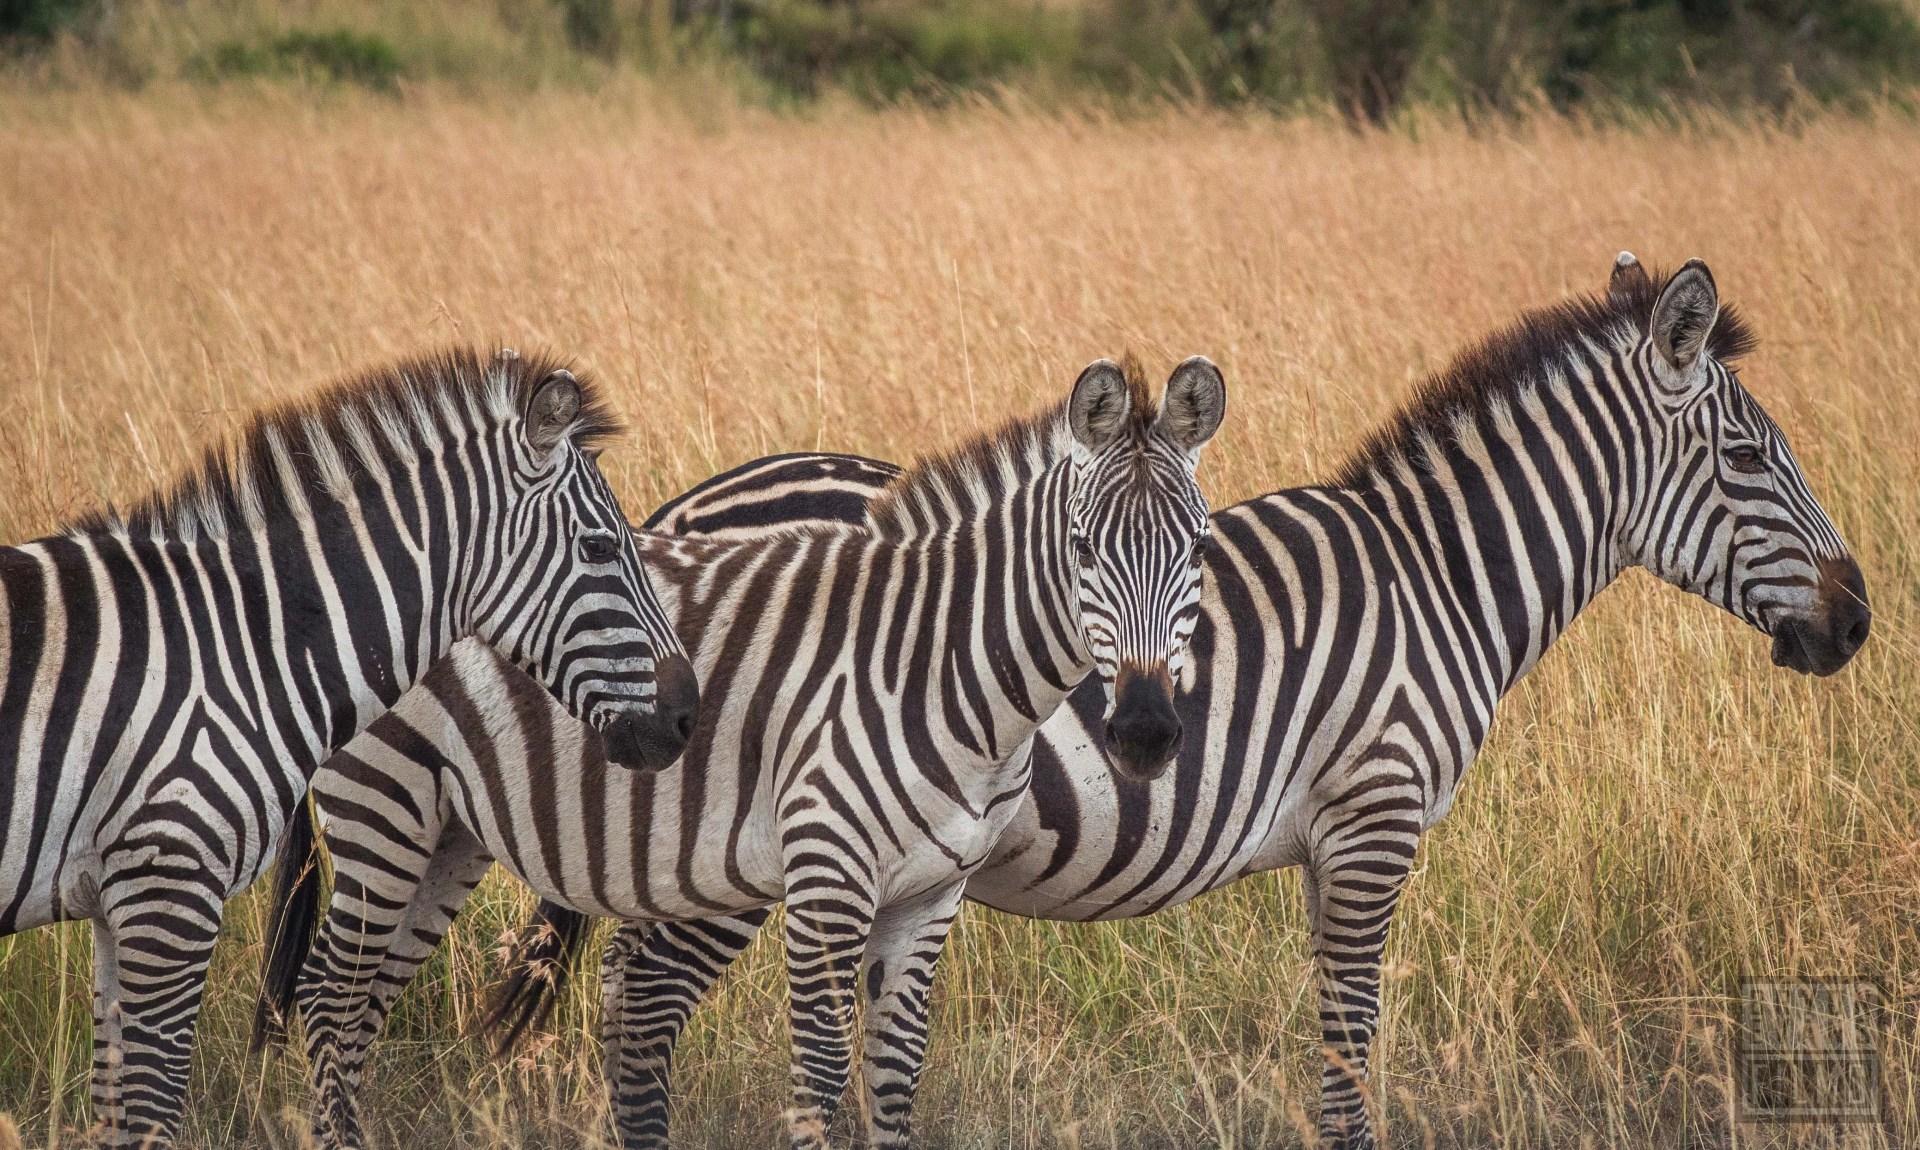 Zebras near Massai Mara